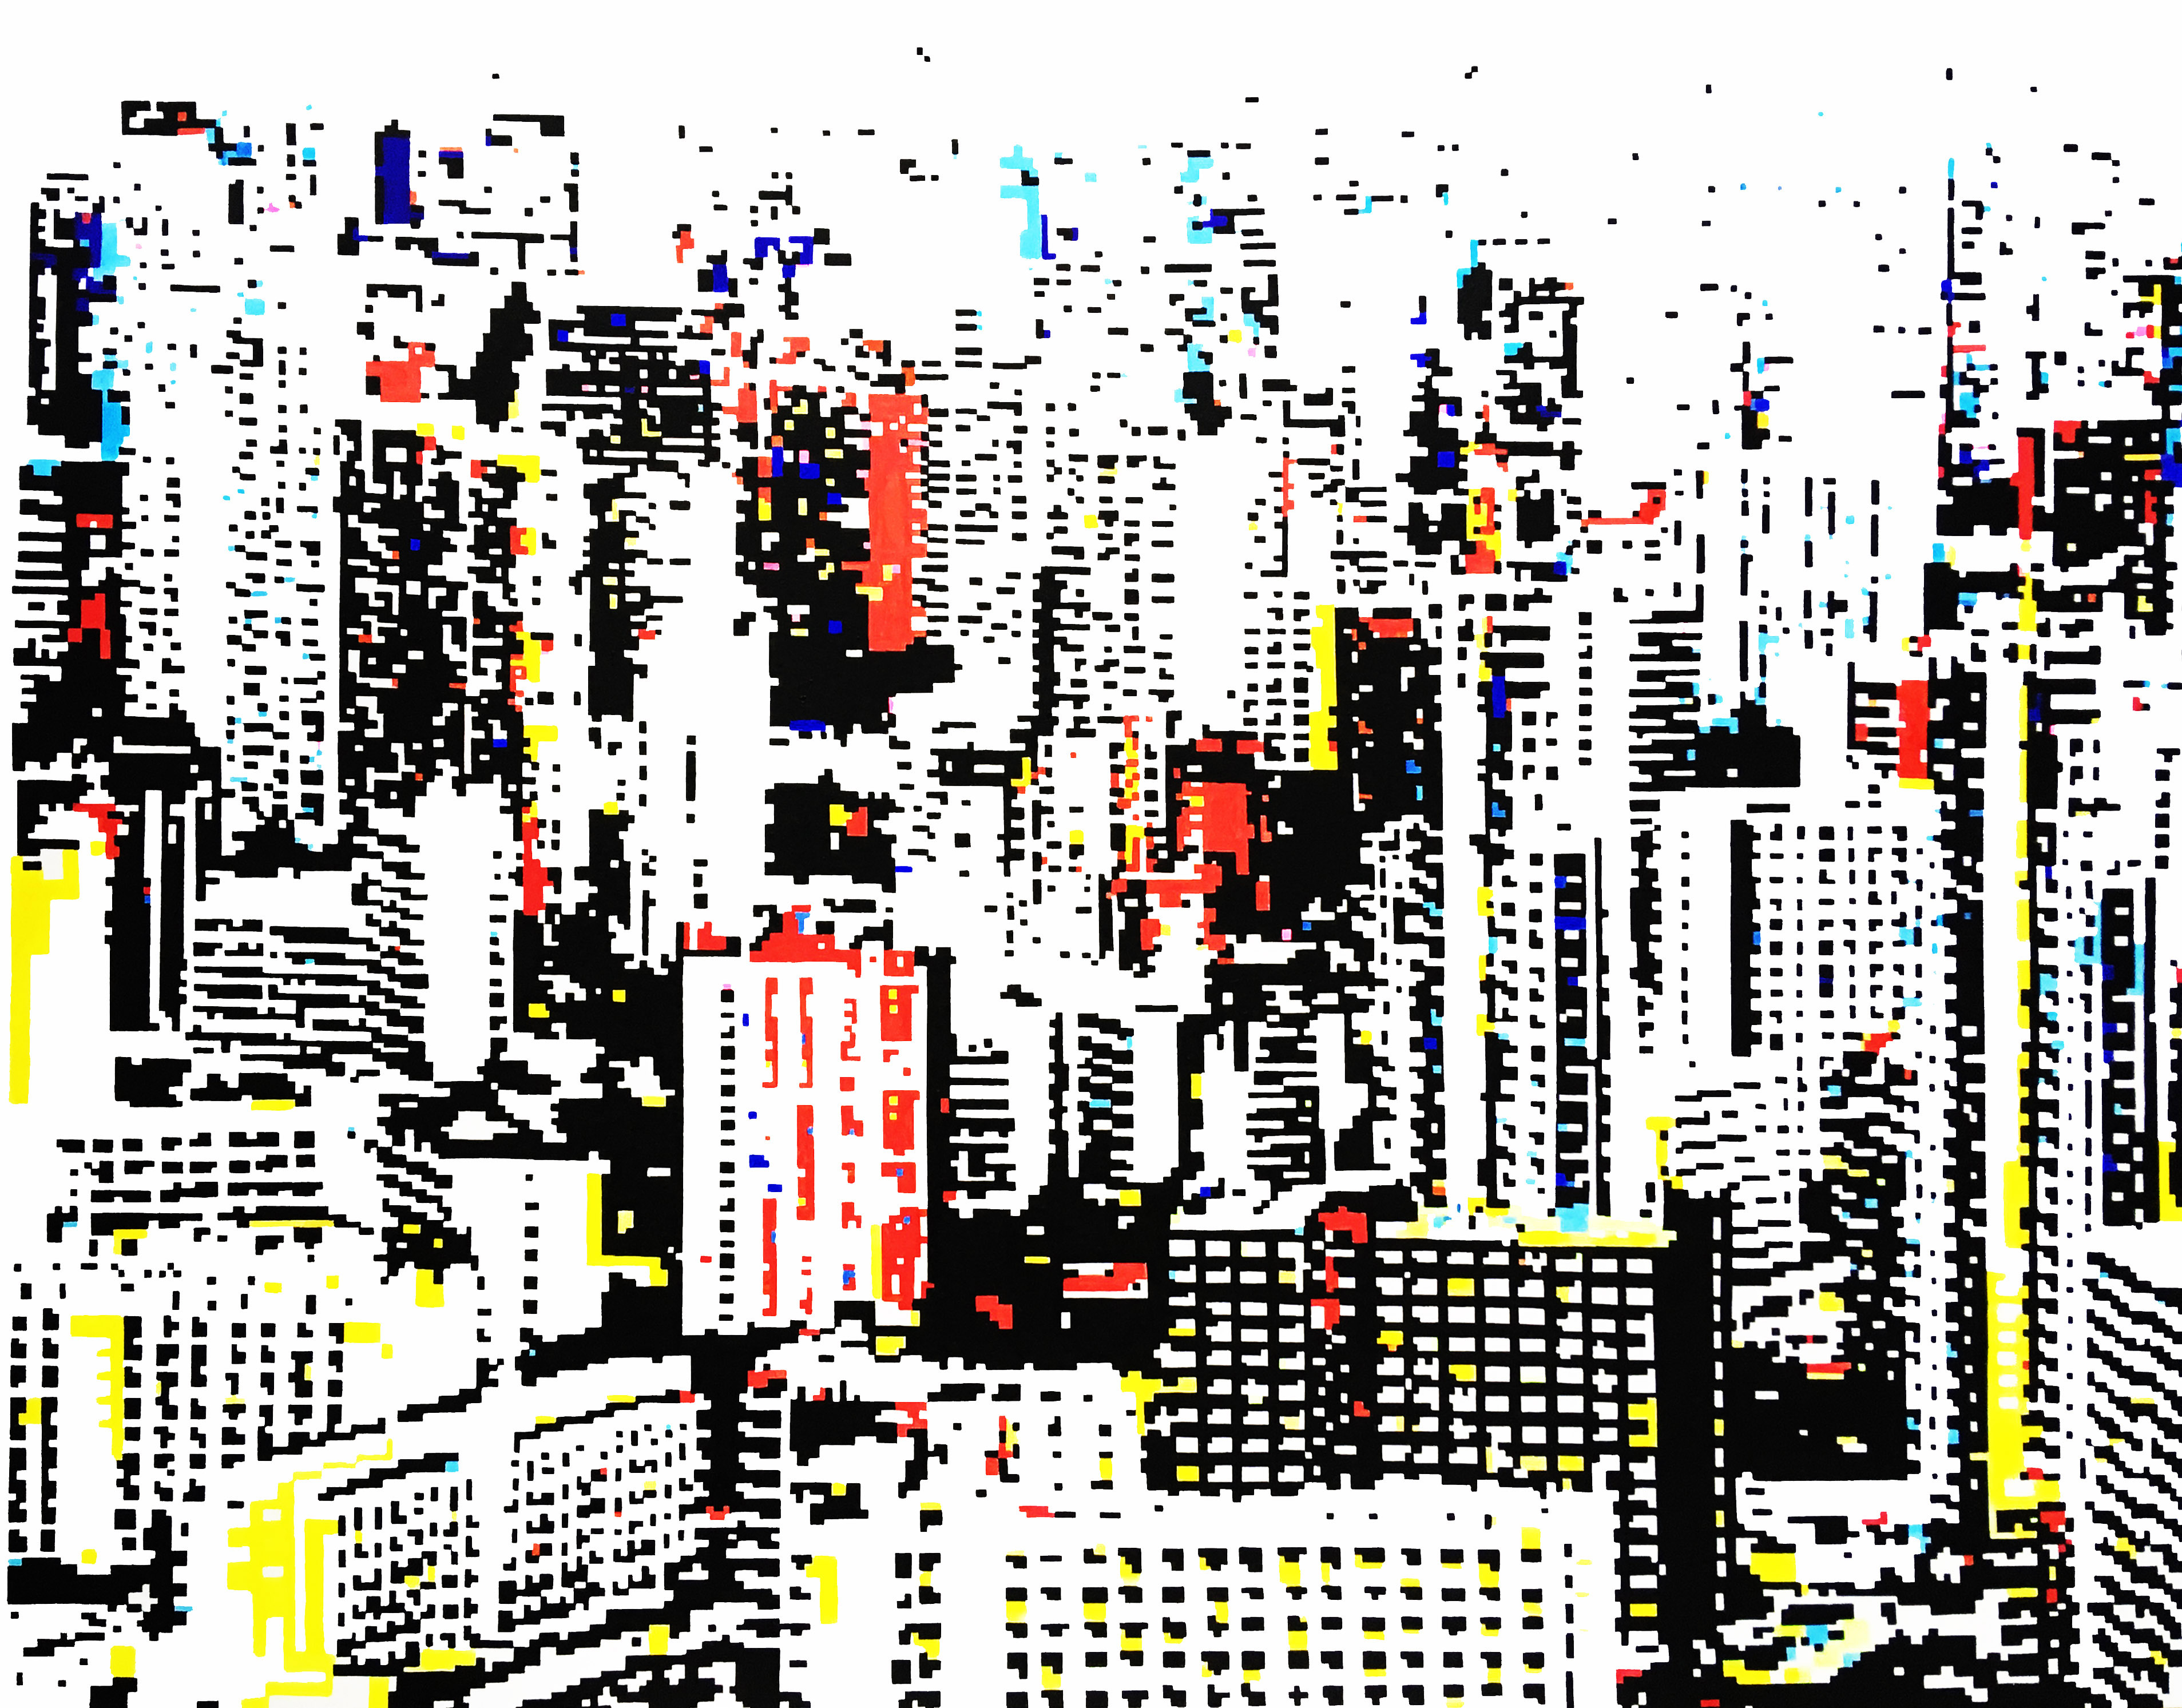 MEGALÓPOLIS HONG KONG